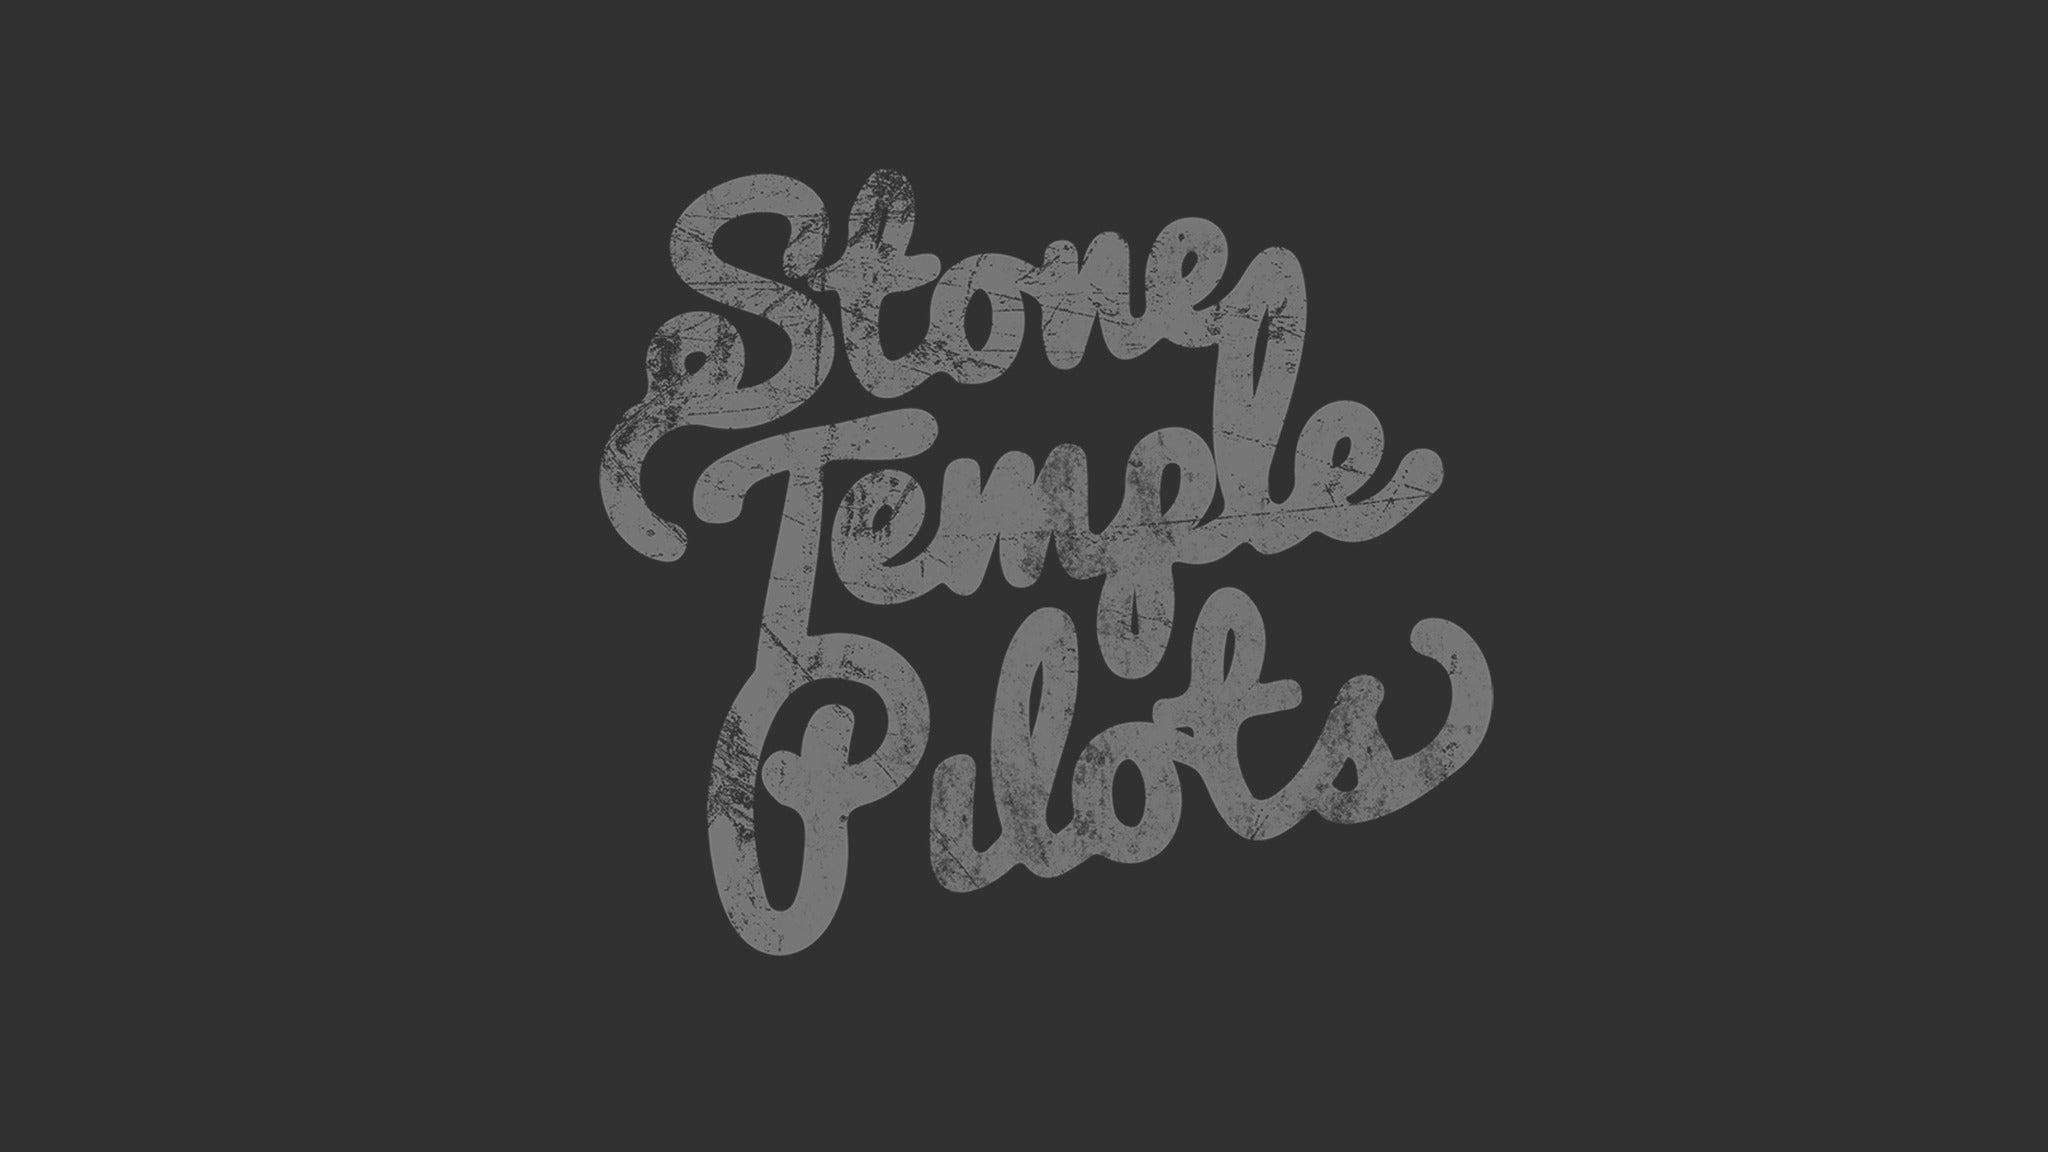 Stone Temple Pilots at U.S. Cellular Center